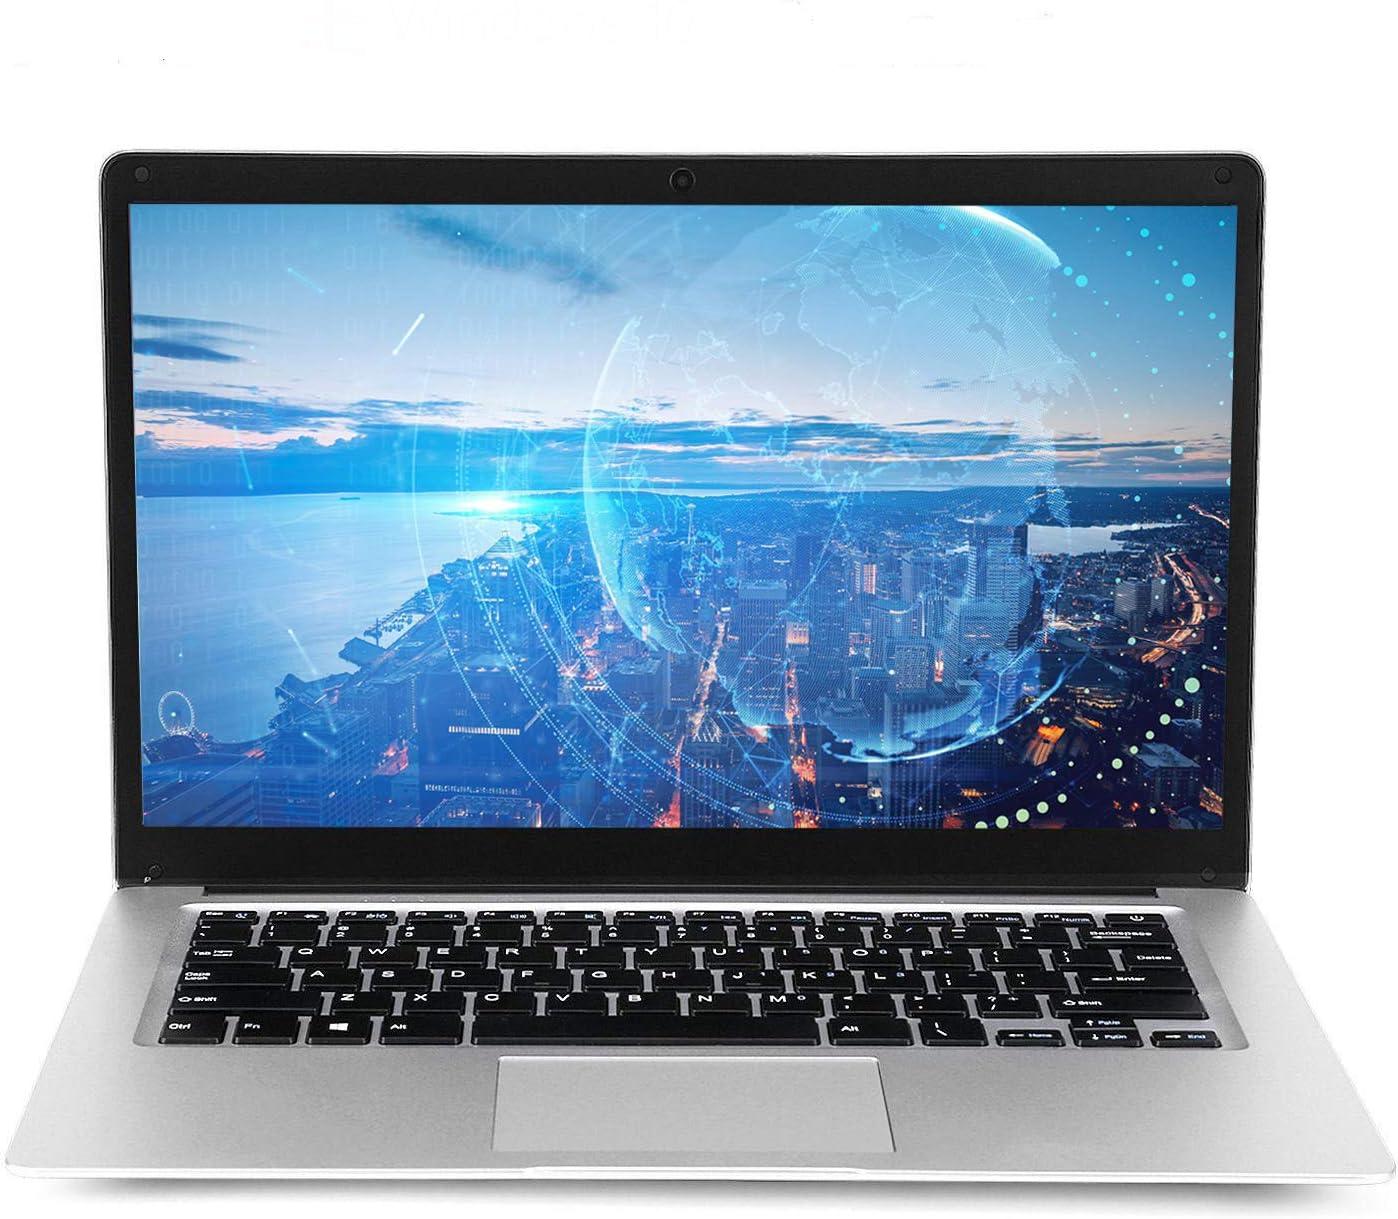 15.6 inch Laptop (Intel J3455 64 bit ,8GB DDR3 RAM ,256GB SSD ,10000mAH Battery ,HD Webcam ,Windows 10 OS Preinstalled ,1920 1080 FHD IPS Display ) Notebook